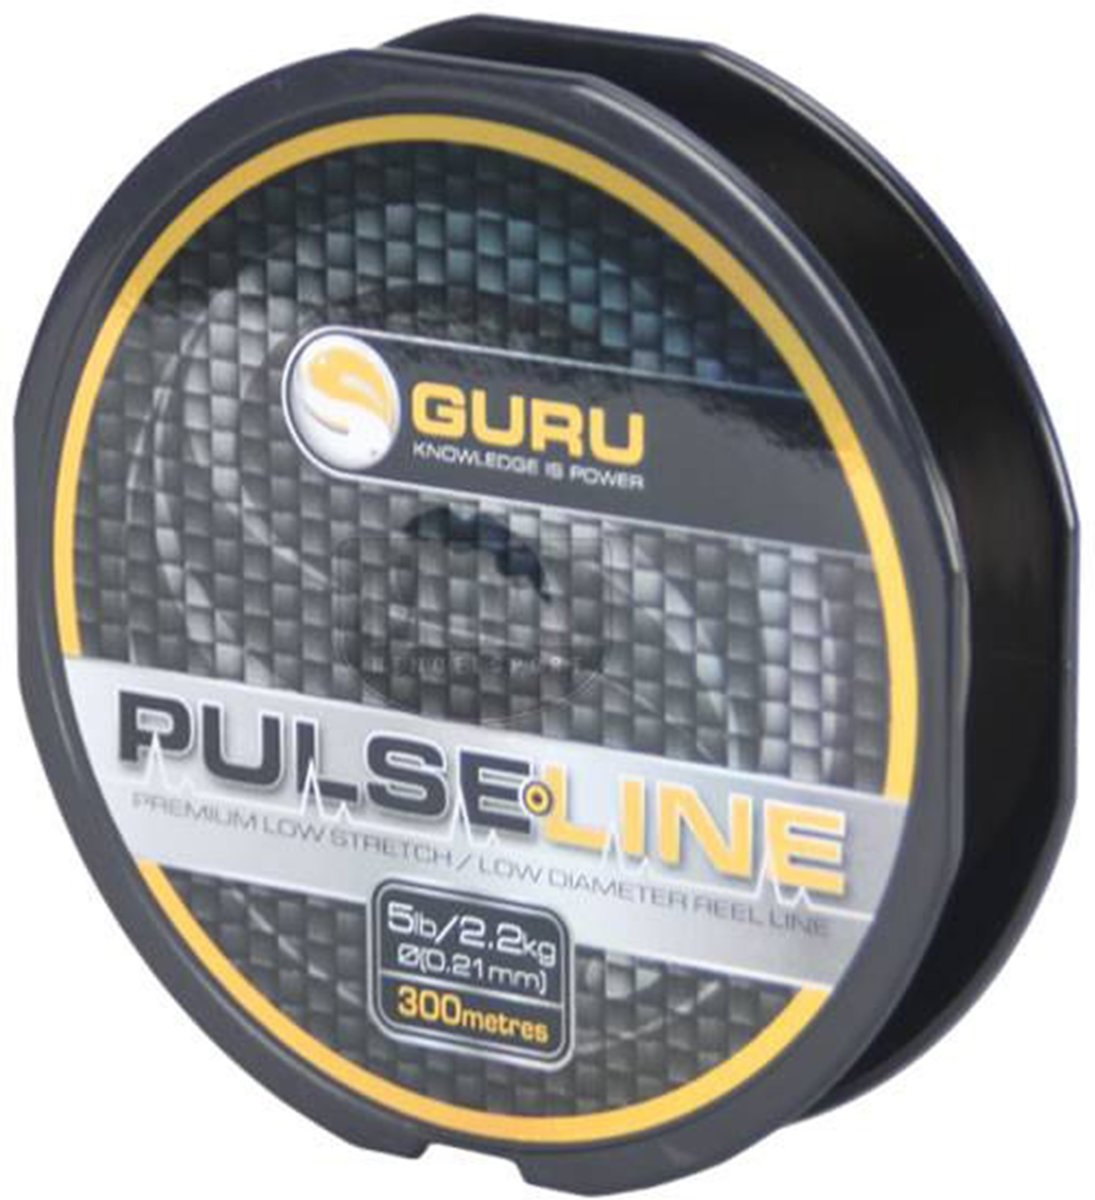 Guru Pulse-Line | Nylon Vislijn | 0.22mm